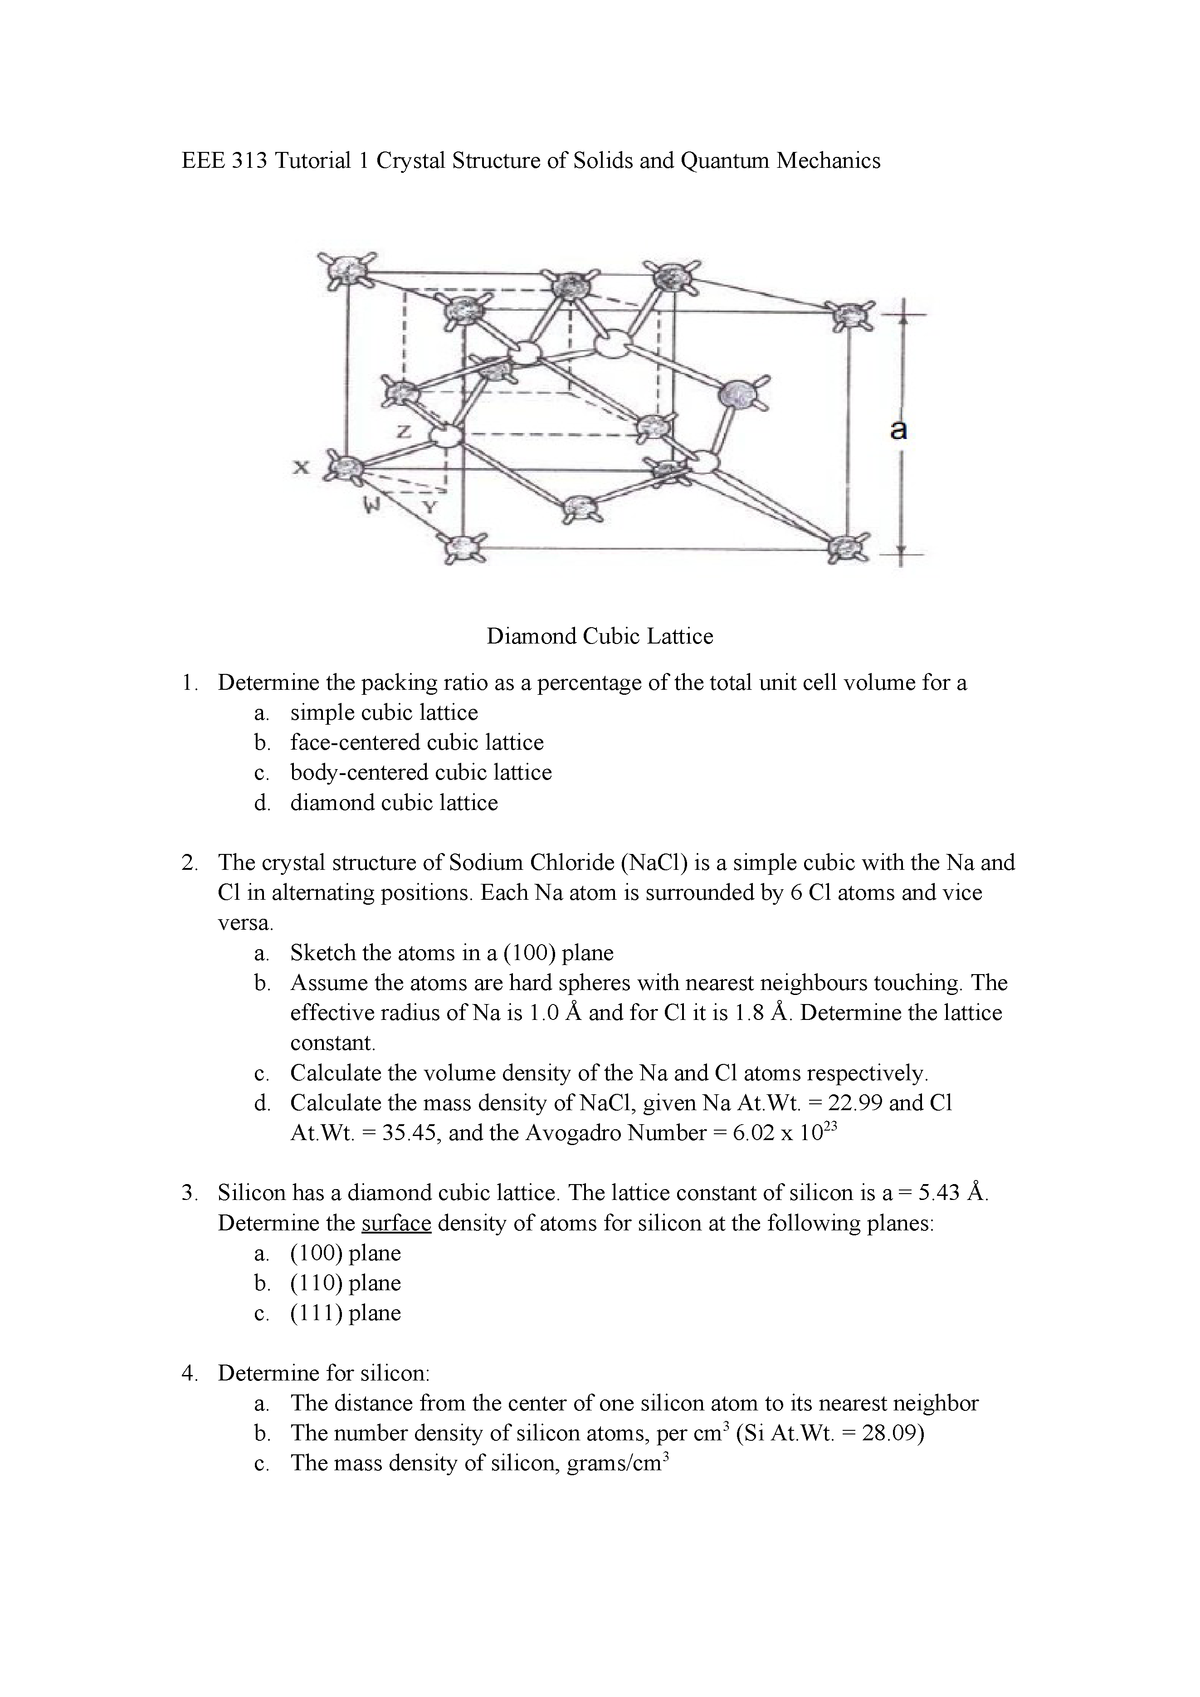 EEE 313 Tutorial 1 - Semiconductor Physics EEE313 - StuDocu